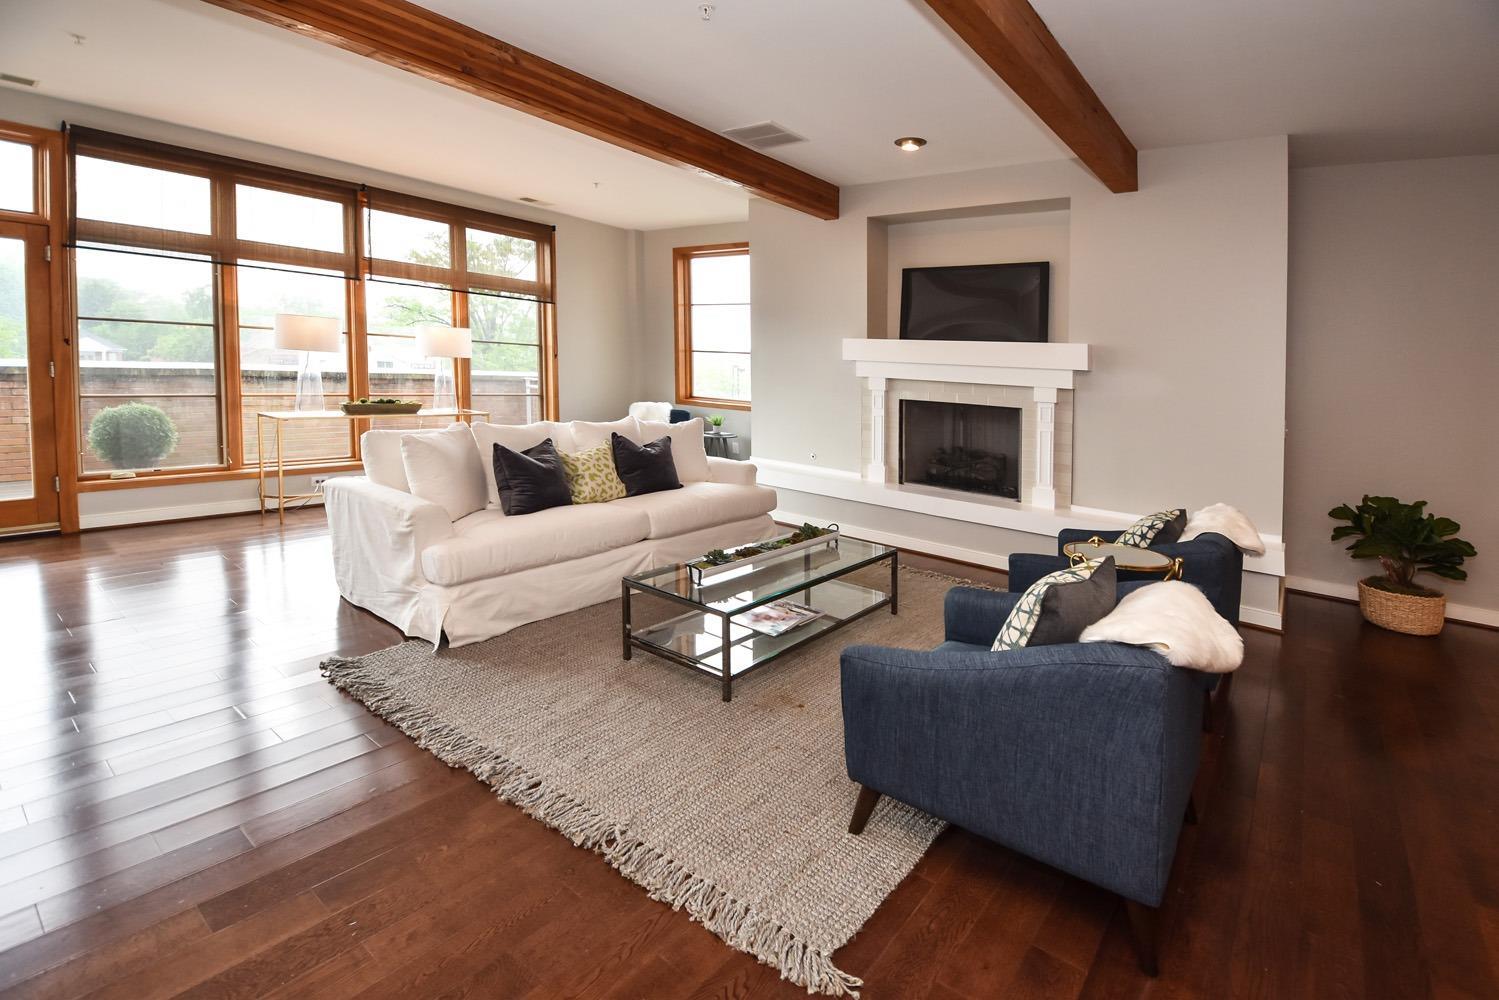 Property for sale at 9348 Towne Square Avenue Unit: 12, Blue Ash,  OH 45242